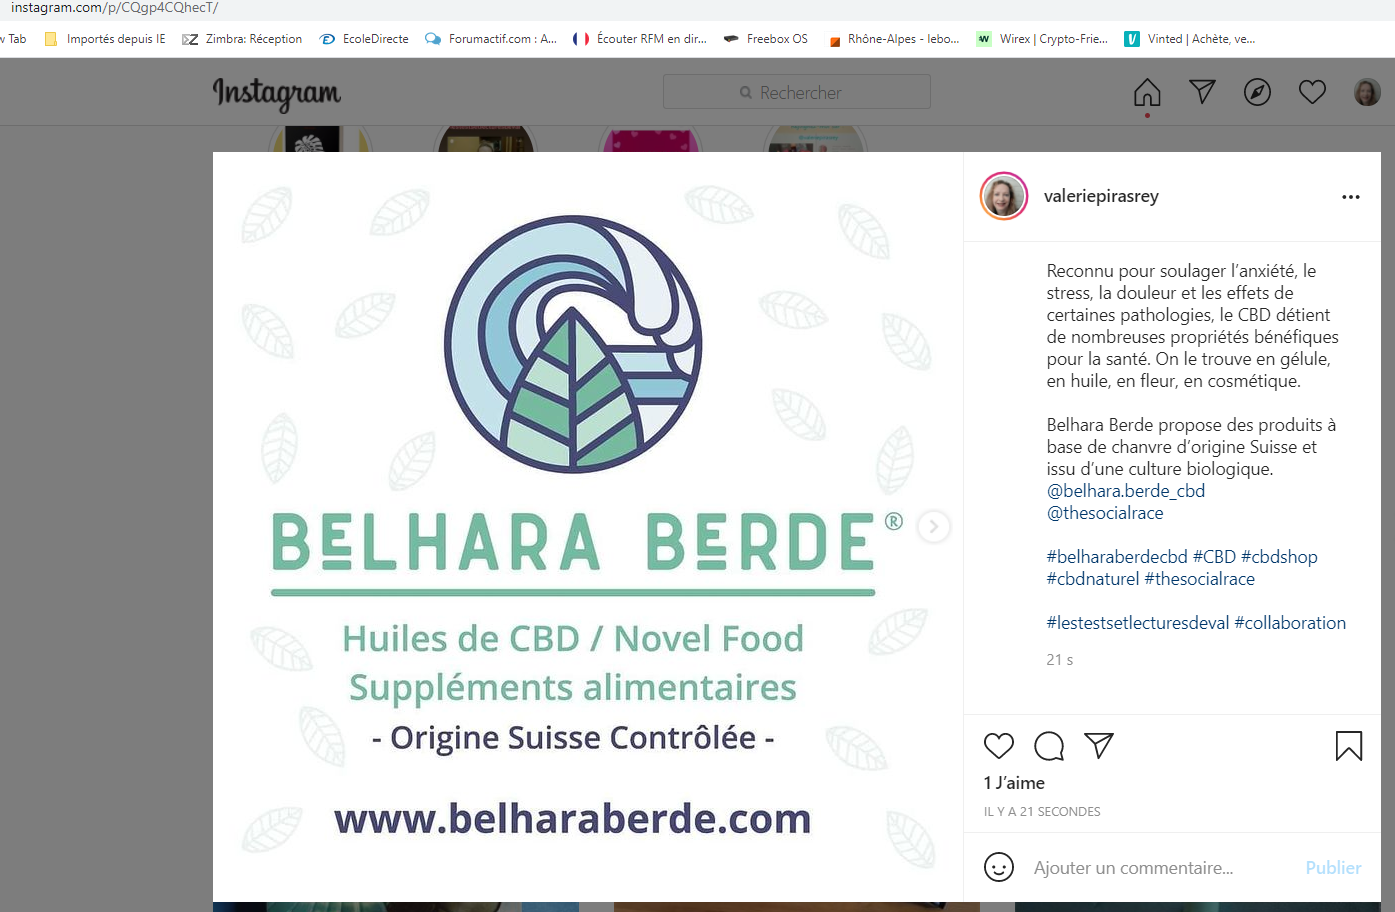 Promotion de la marque Belhara Berde